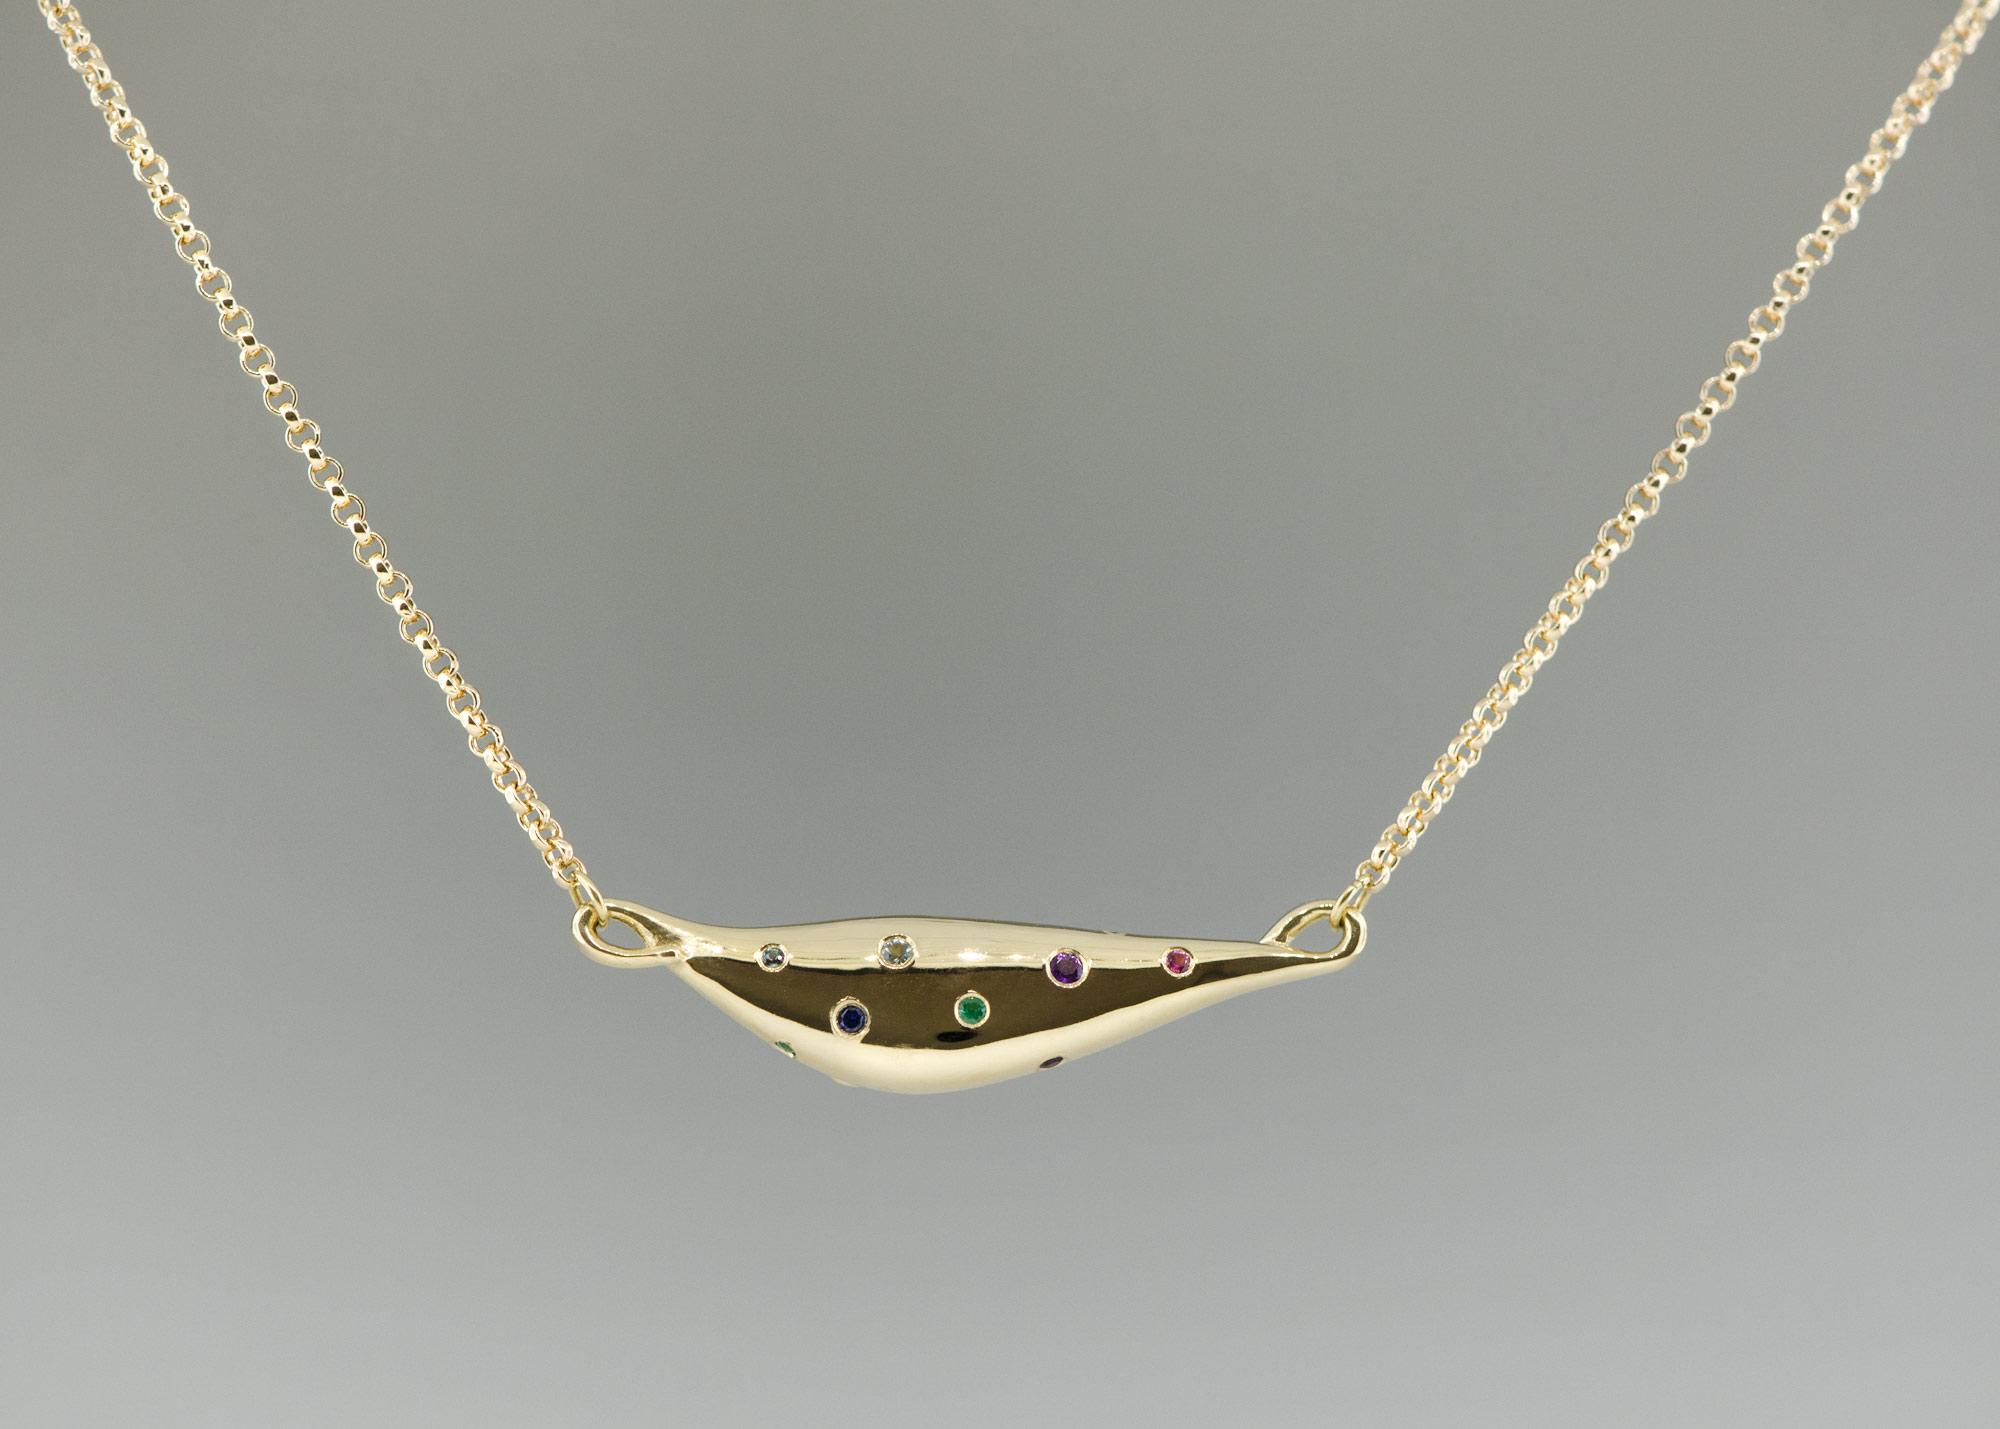 70'th birthday necklace